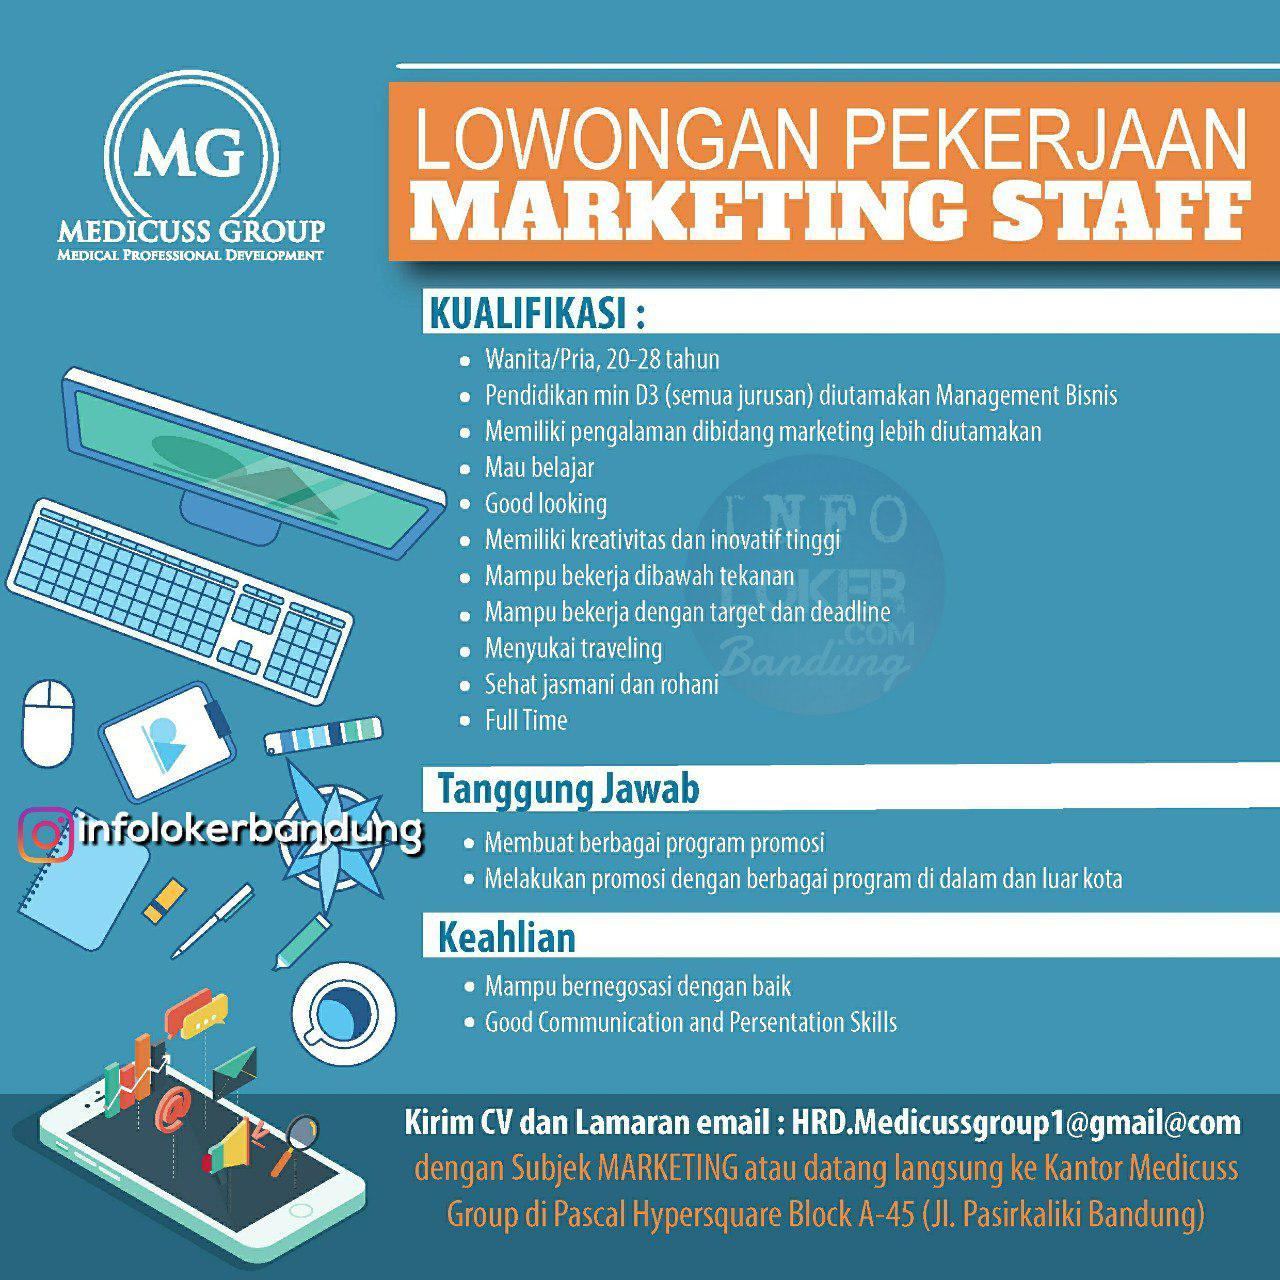 Lowongan Kerja Medicuss Group Bandung Oktober 2018